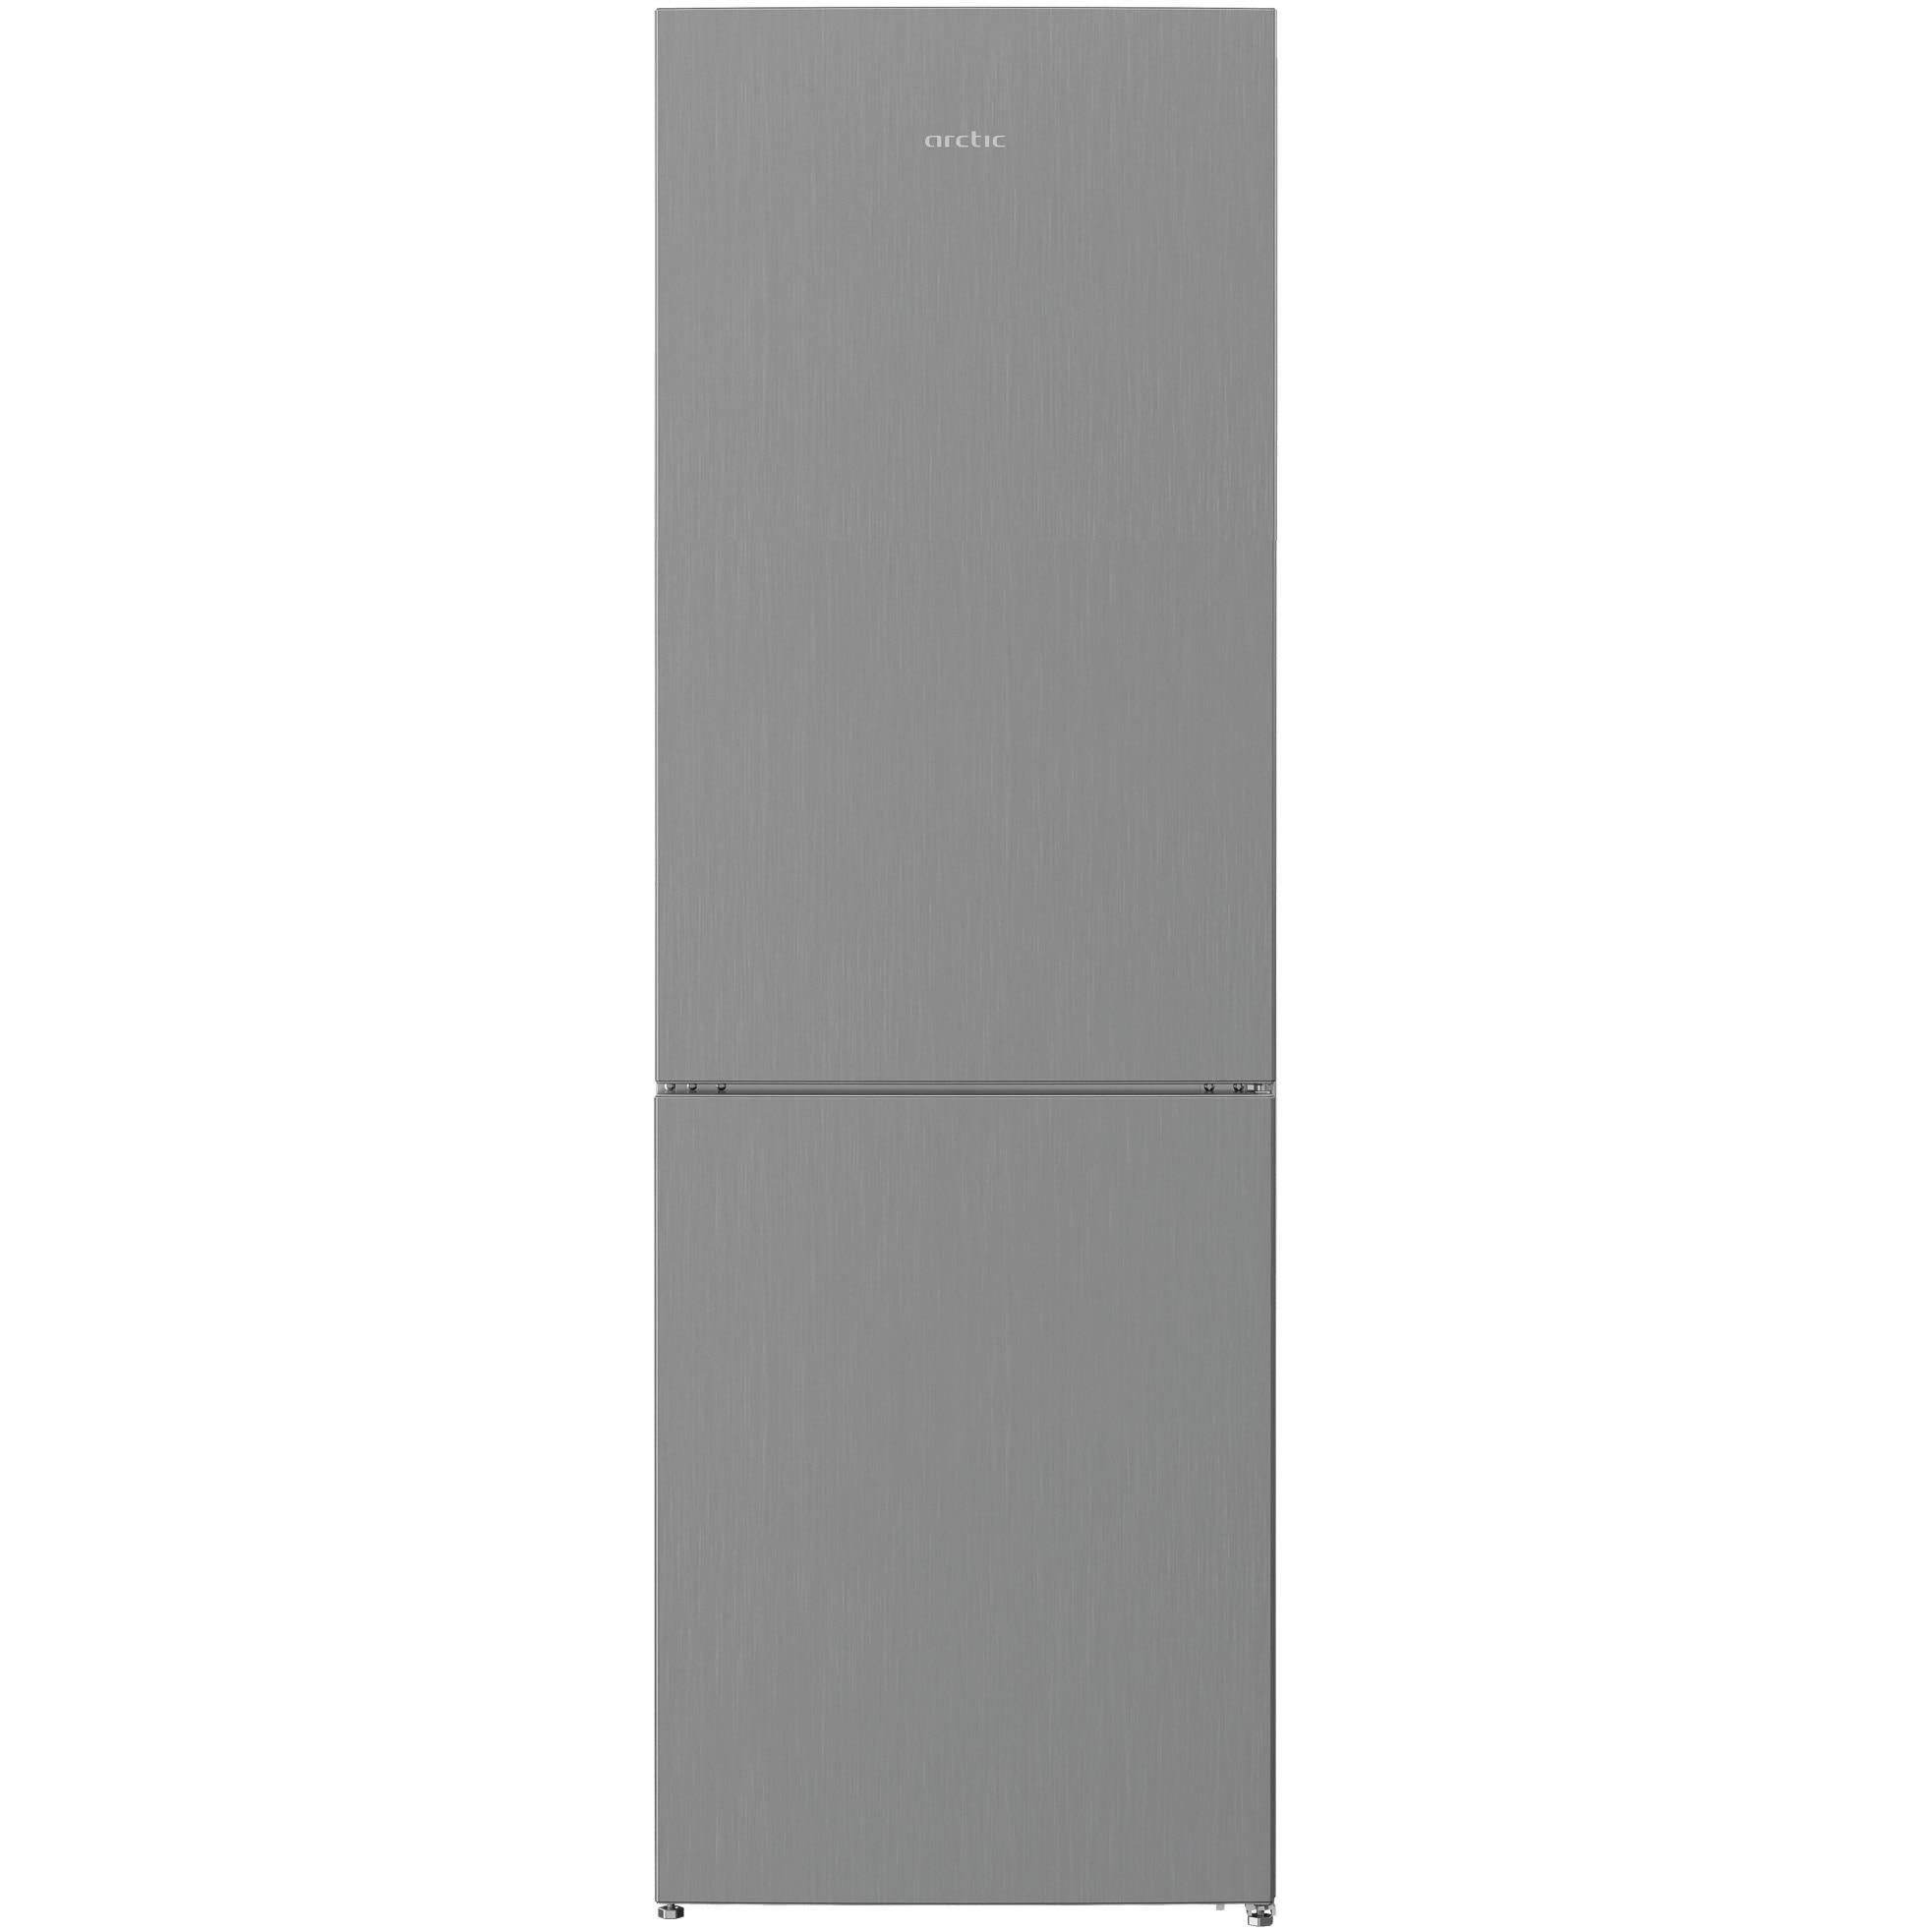 Fotografie Combina frigorifica Arctic AK60366M30NFMT , 324 l, Clasa F, Full No Frost, Garden Fresh, Air Flow Dual Tech, H 185.2 cm, Argintiu